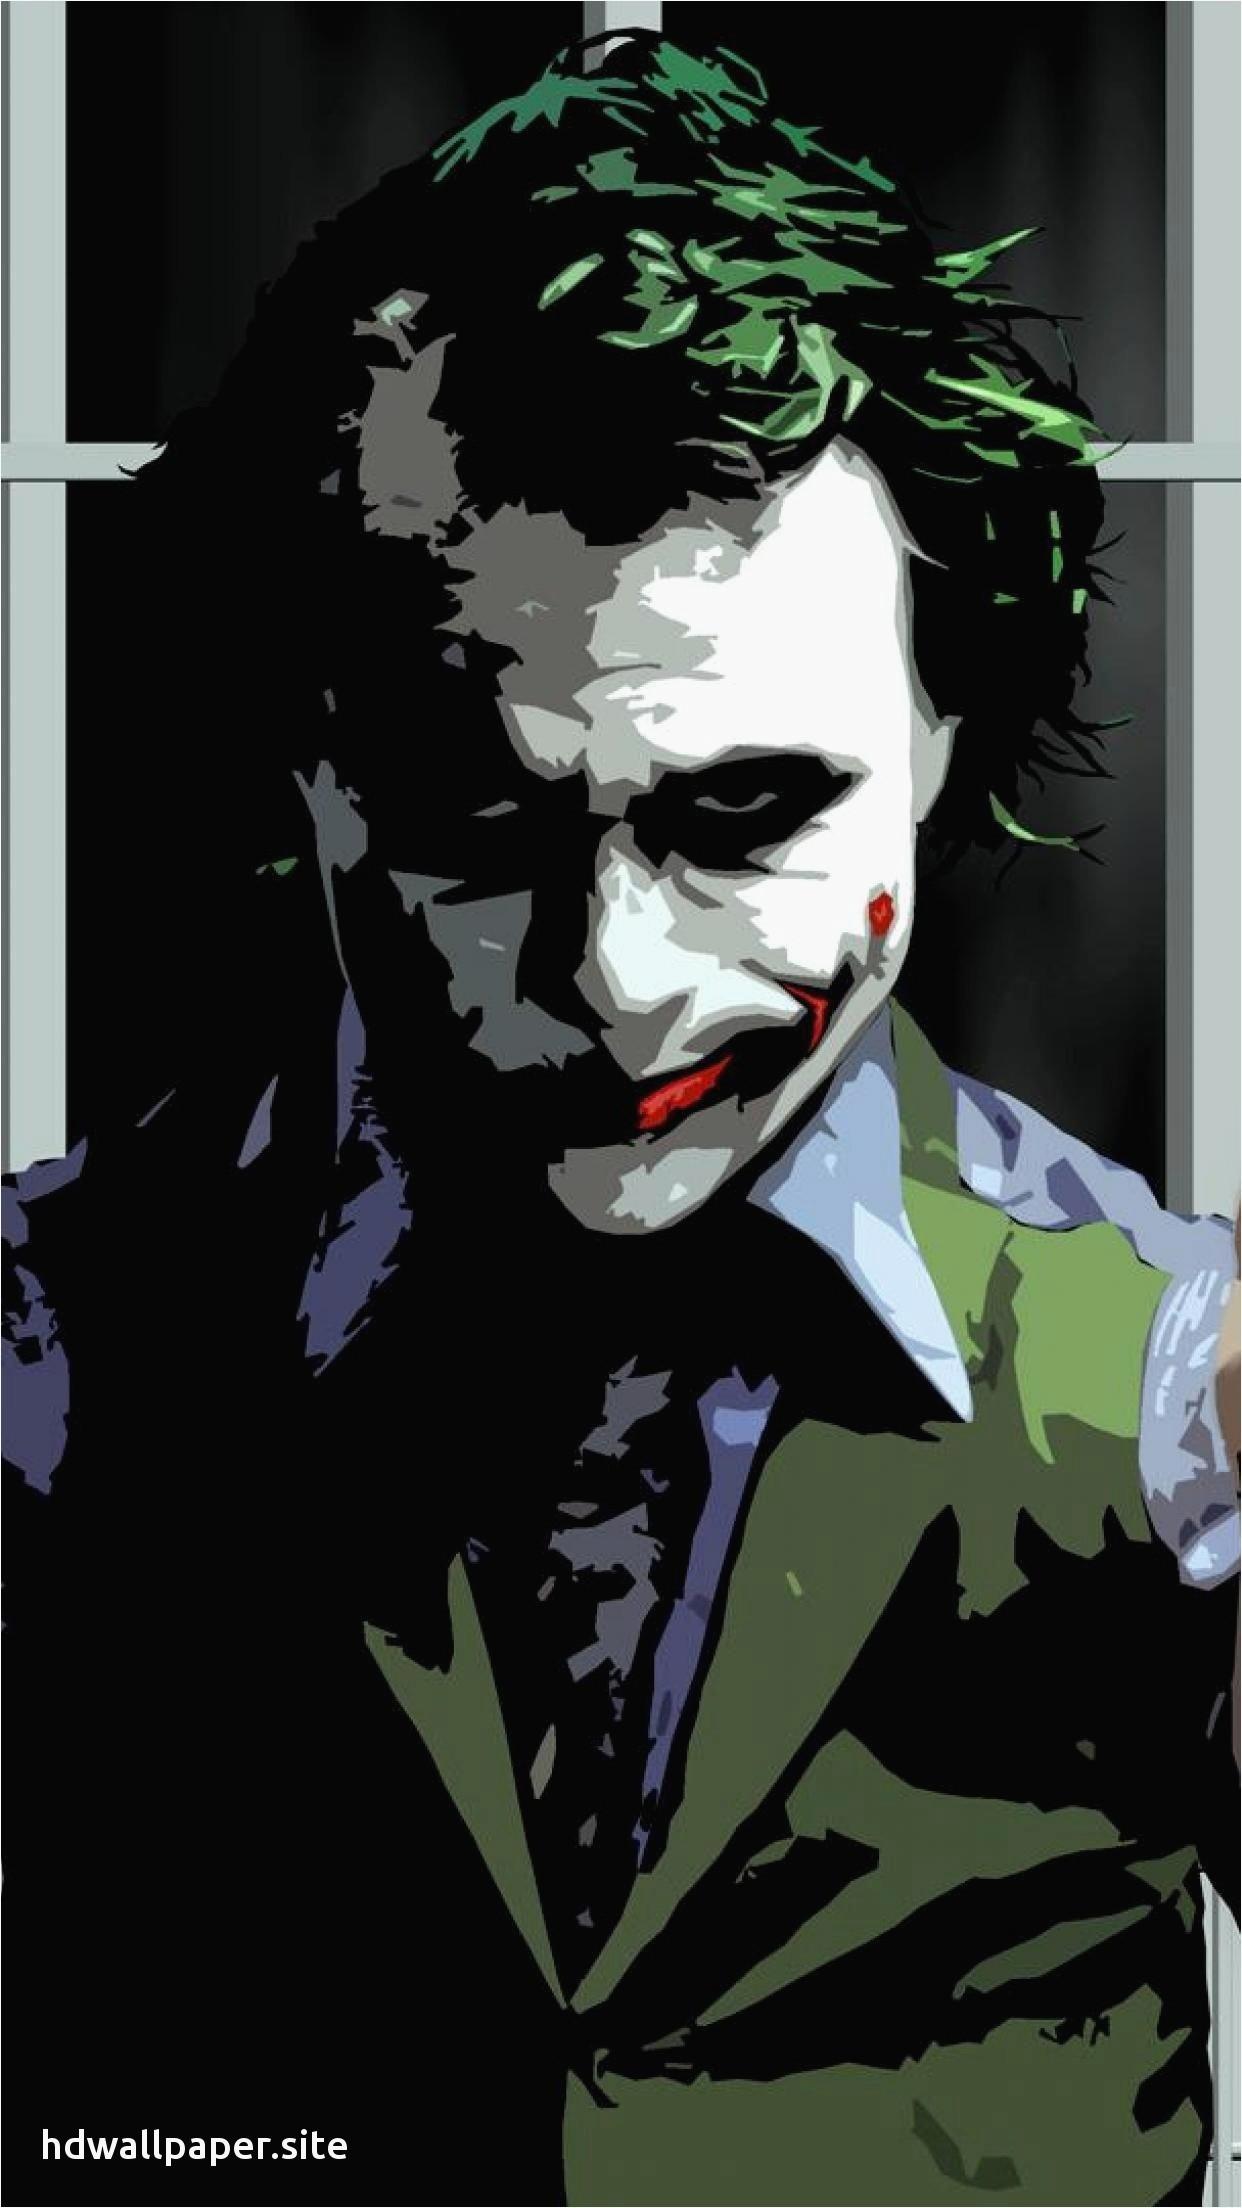 Joker Cool Wallpaper - Joker Hd Wallpaper 4k , HD Wallpaper & Backgrounds